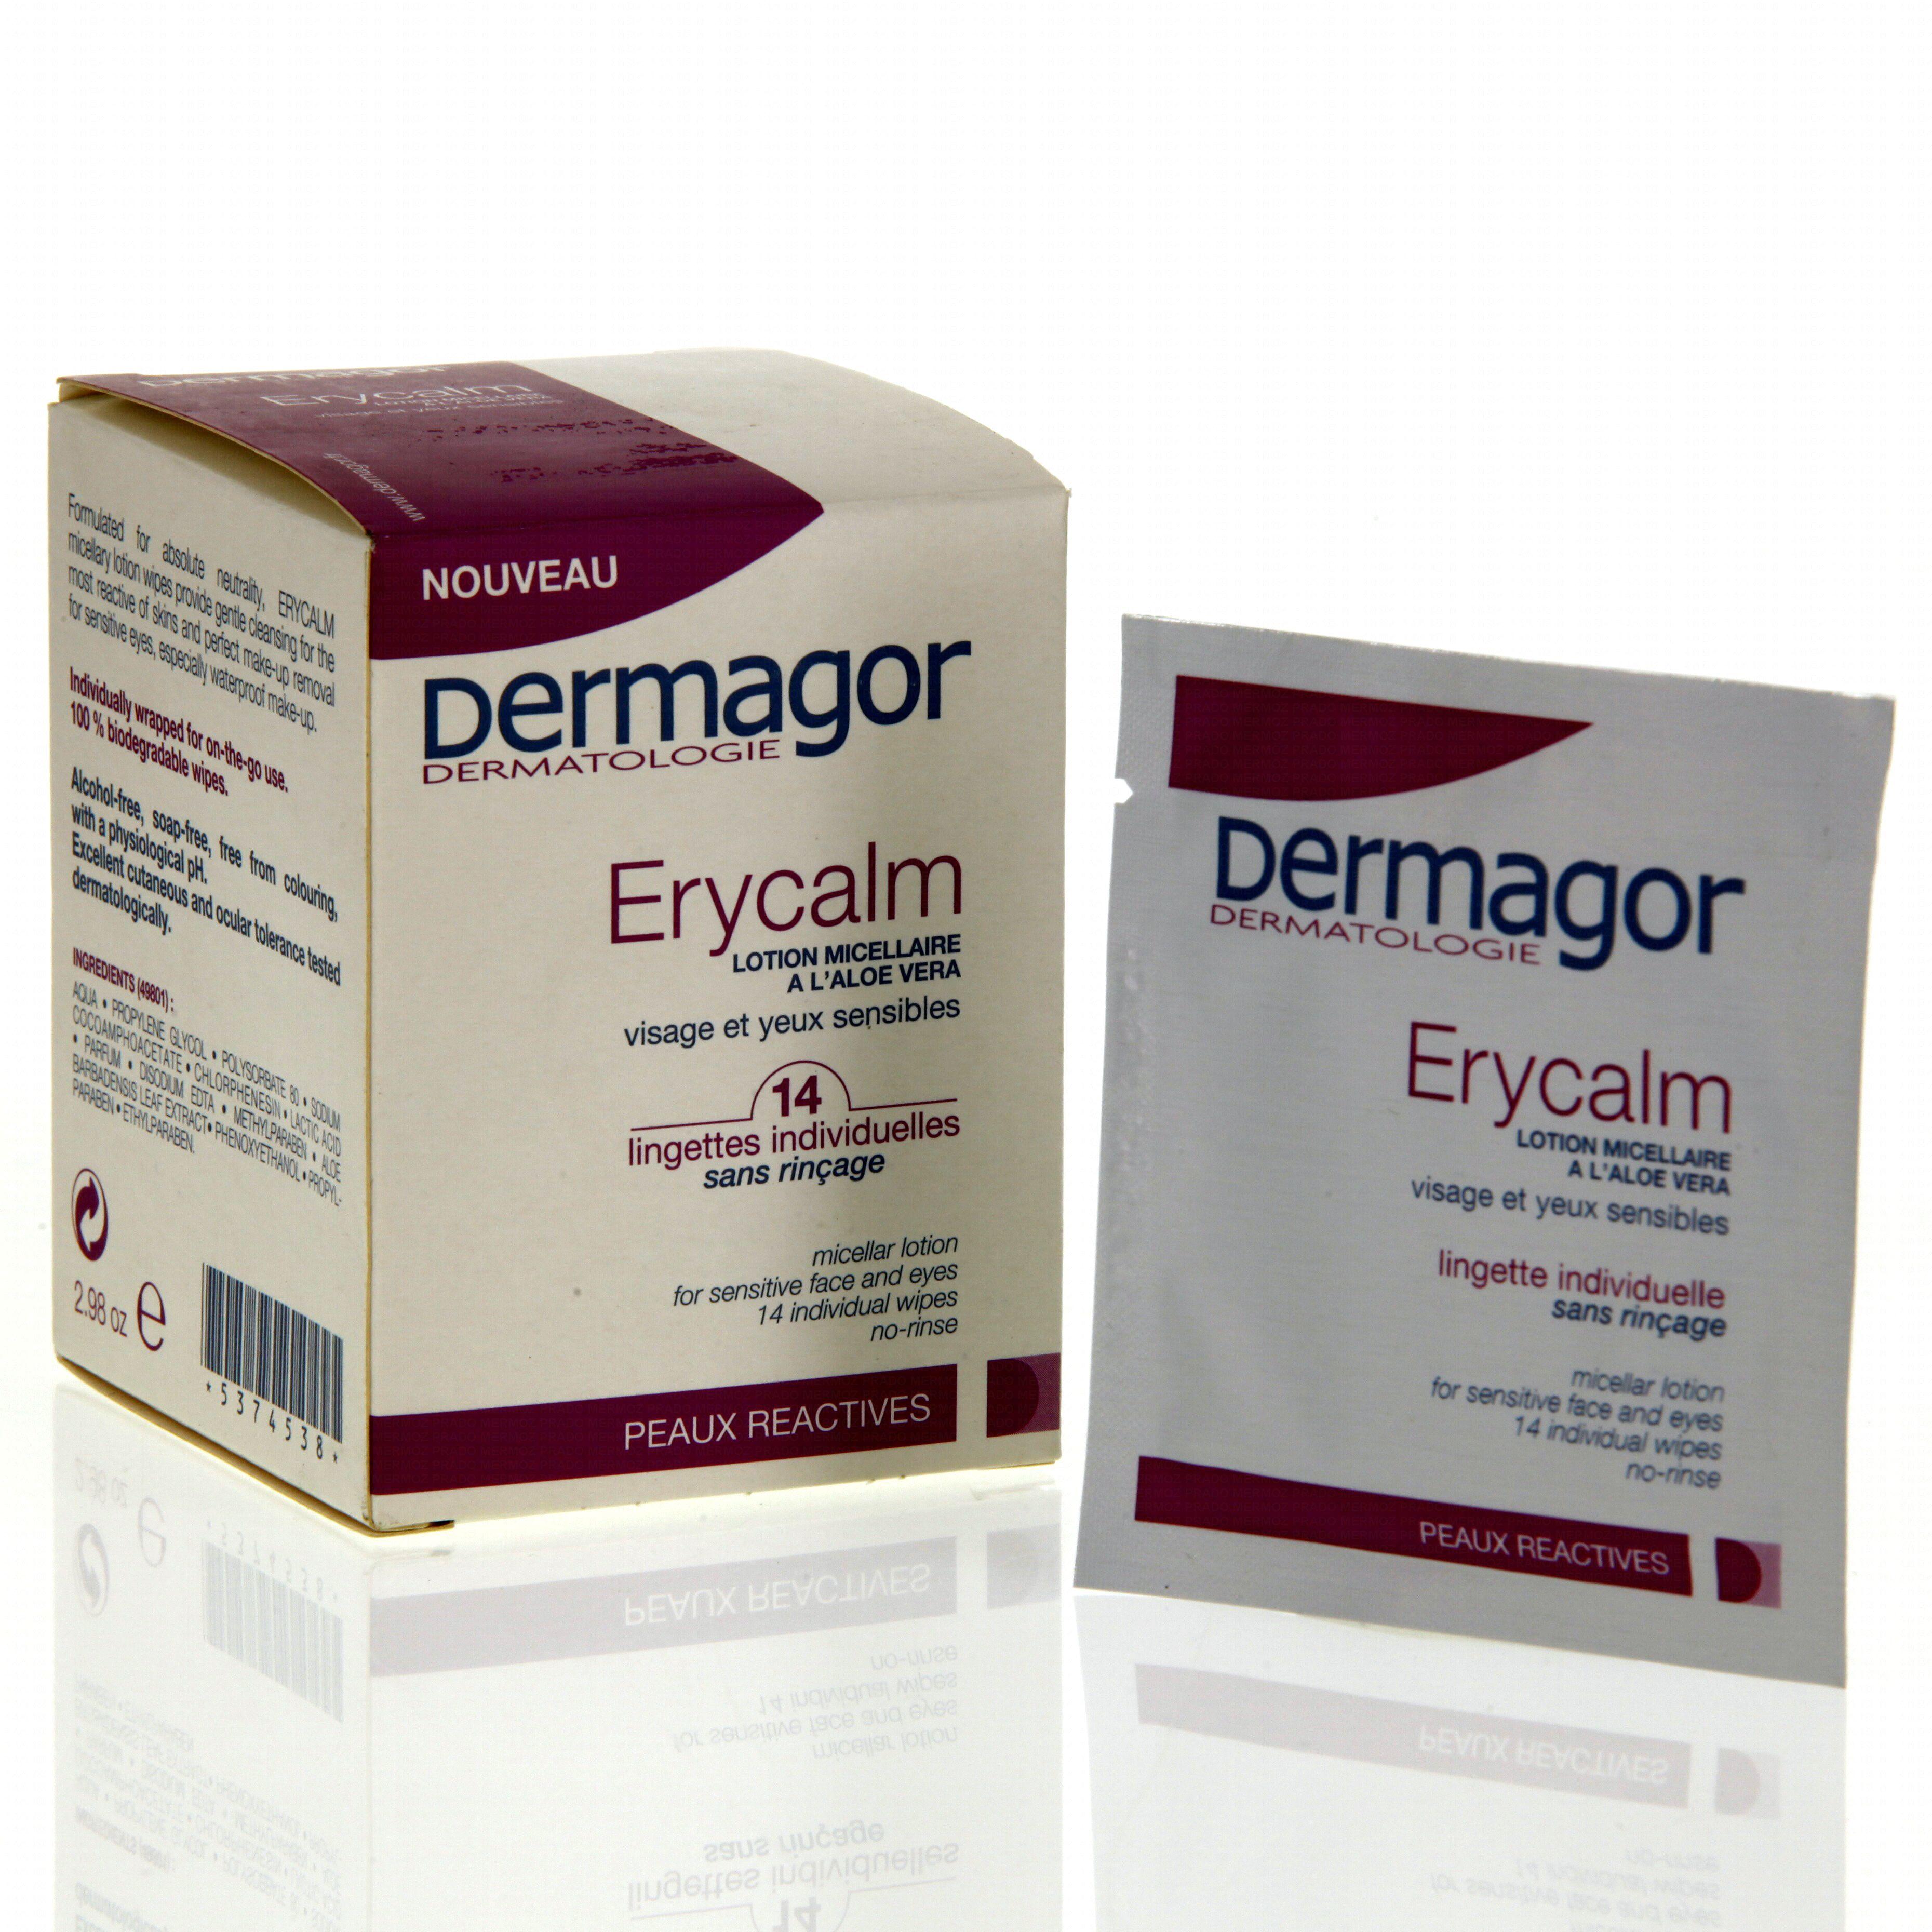 serum physiologique lingettes visage et creme visage